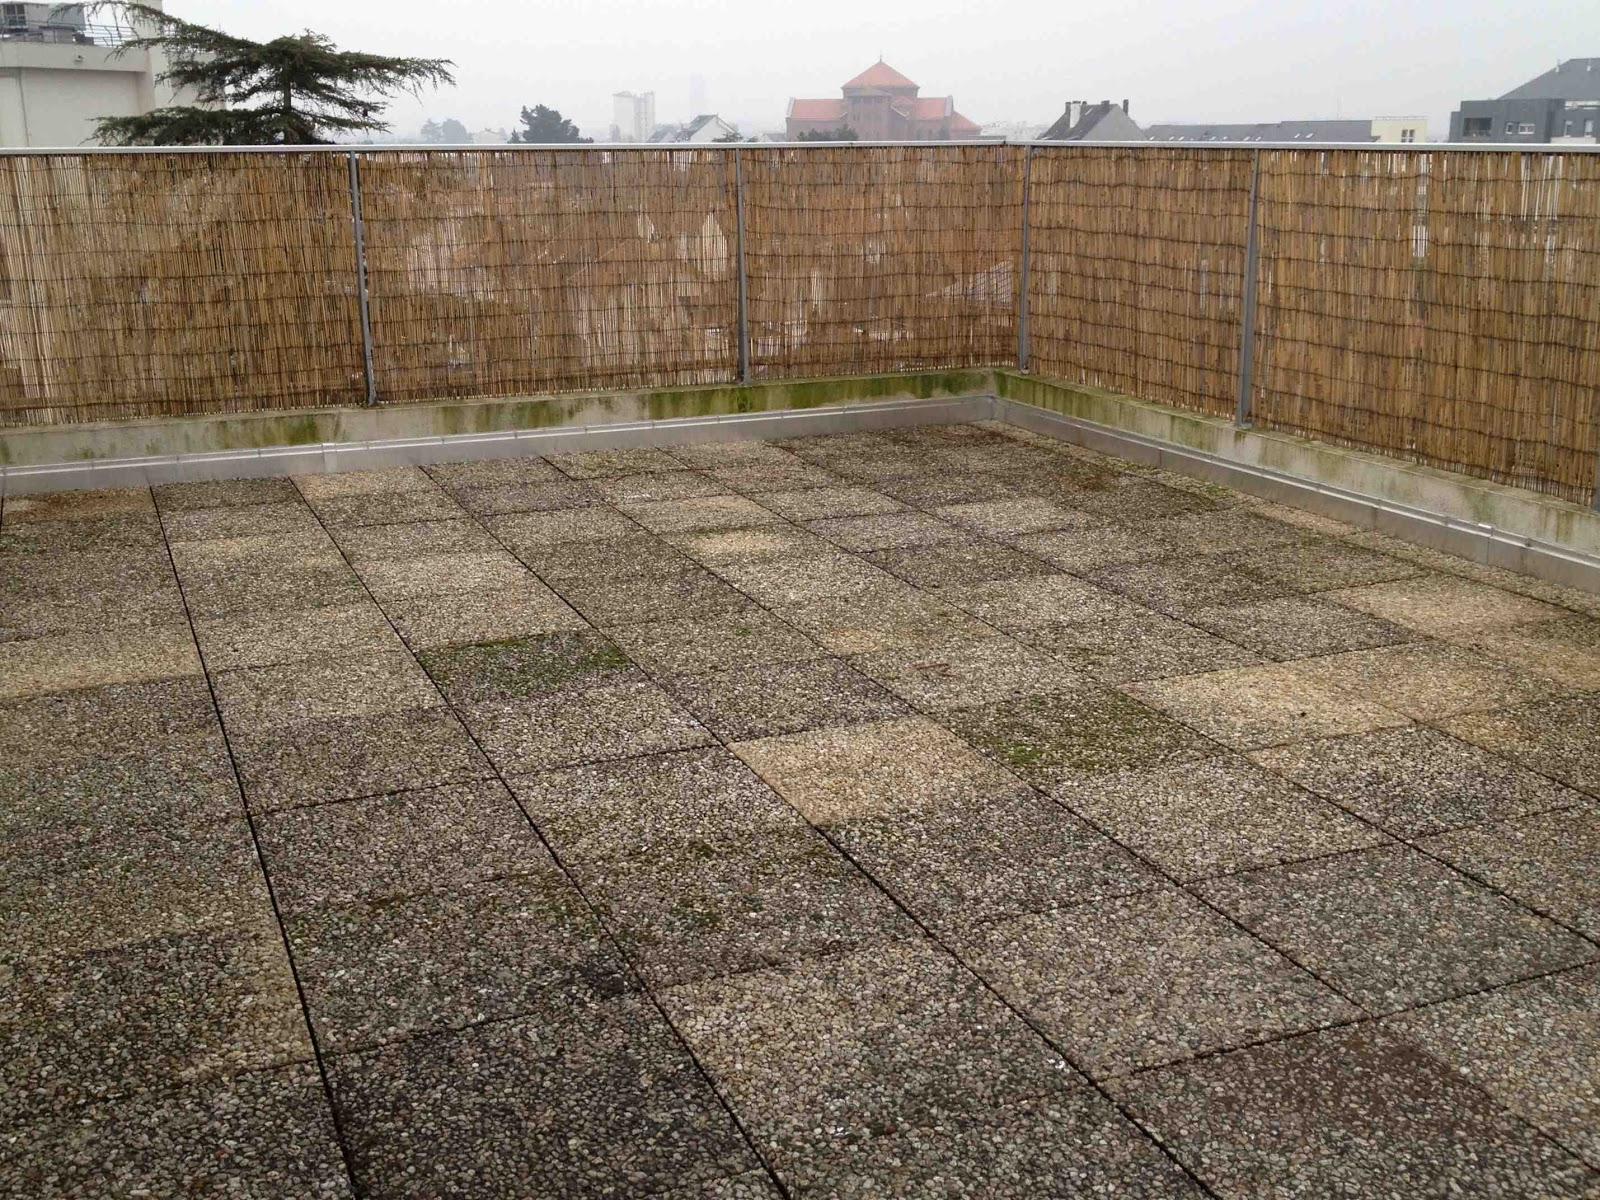 La m tamorphose du balcon nettoyage de printemps for Nettoyage dalle terrasse